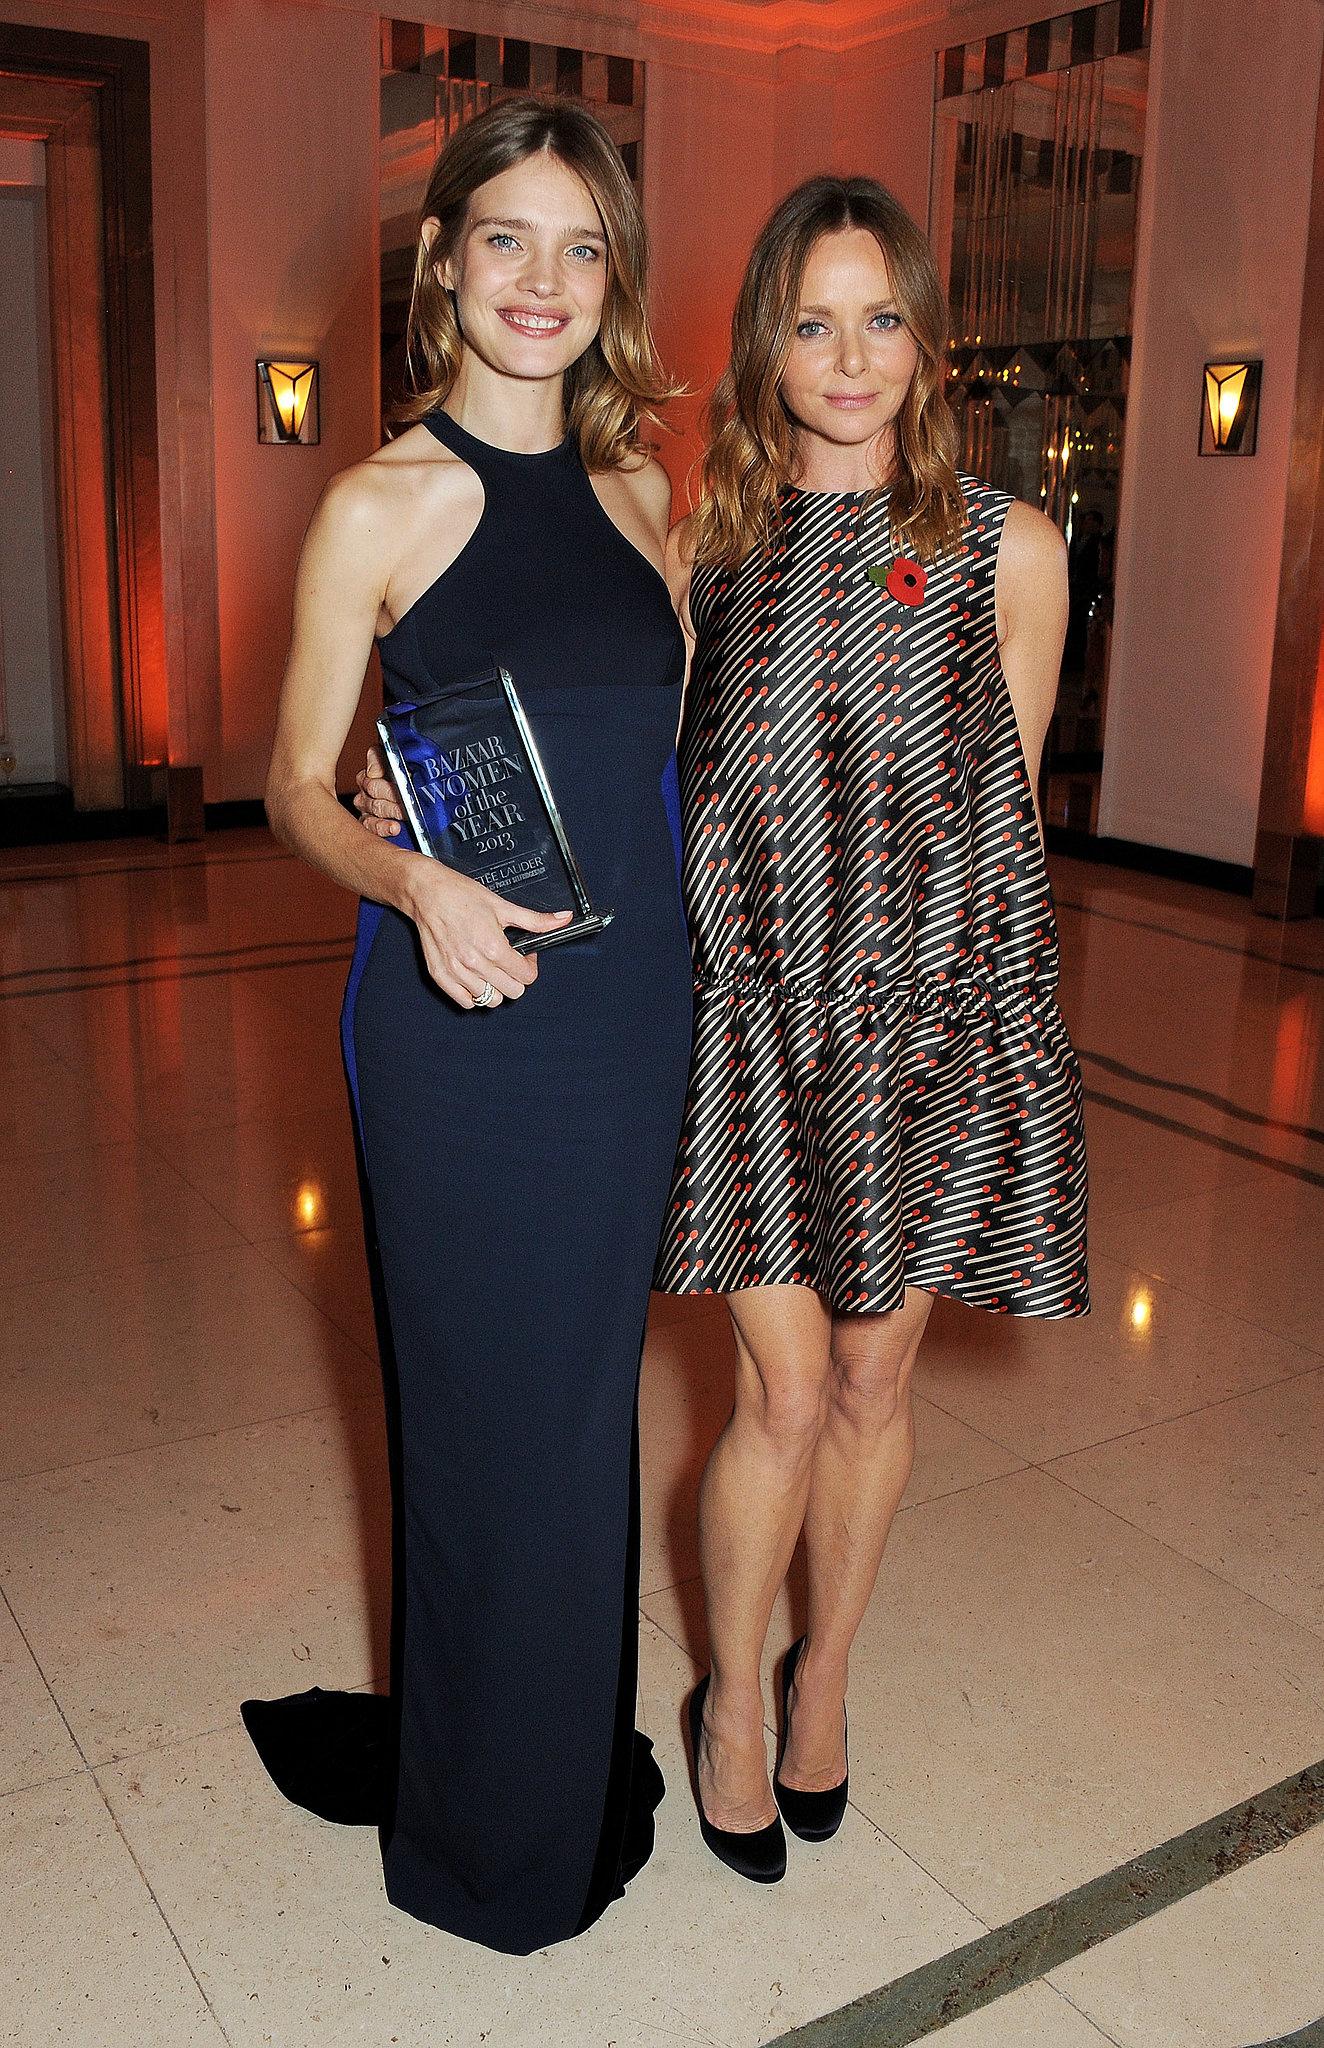 Stella McCartney presented Natalia Vodianova with her Philanthropist of the Year Award at Harper's Bazaar UK's event.